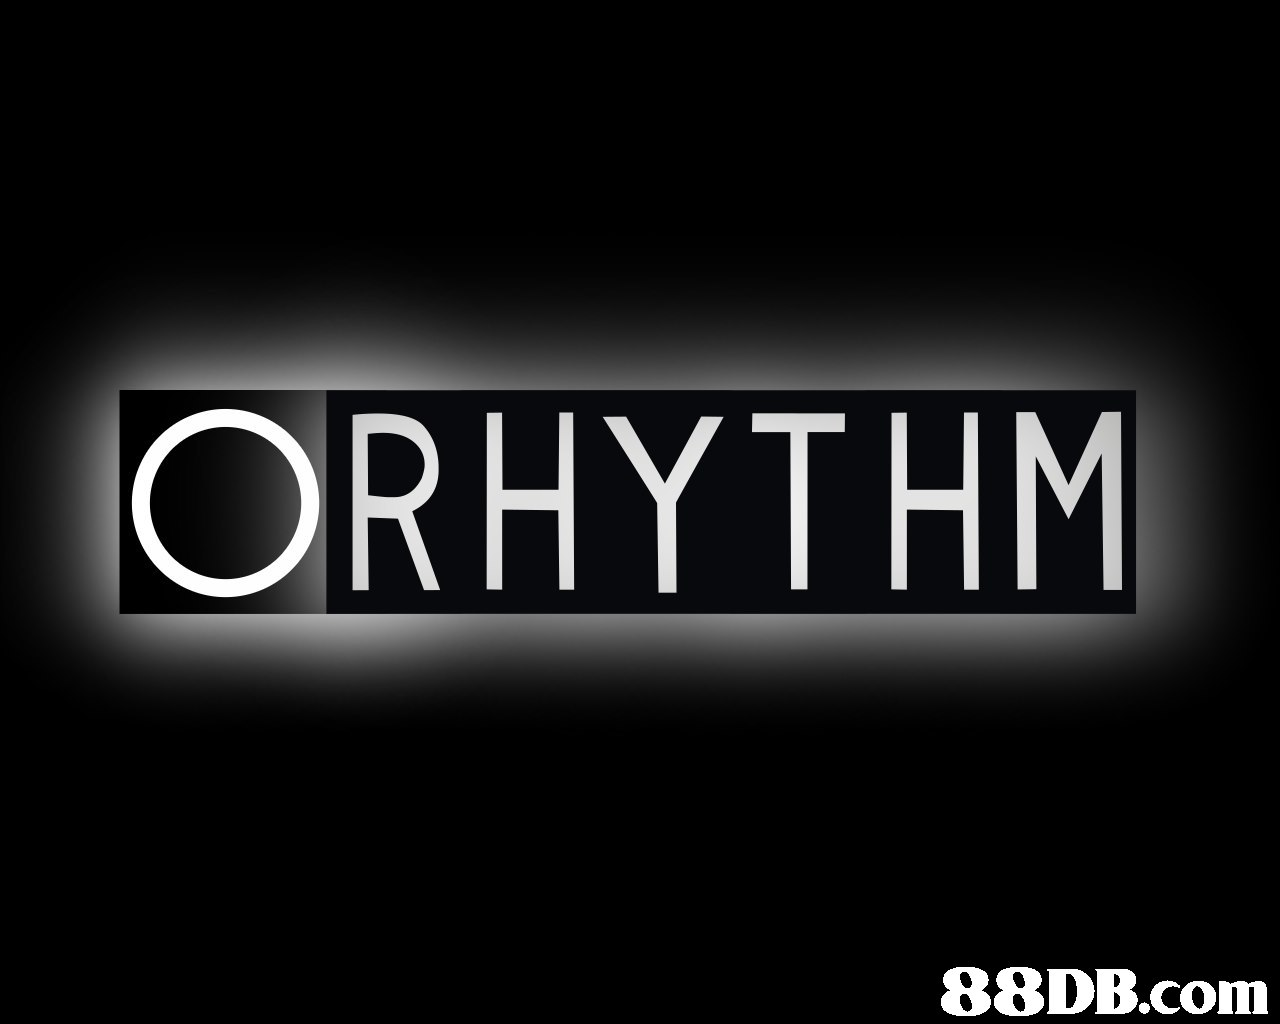 ORHYTHM,text,font,logo,product,brand